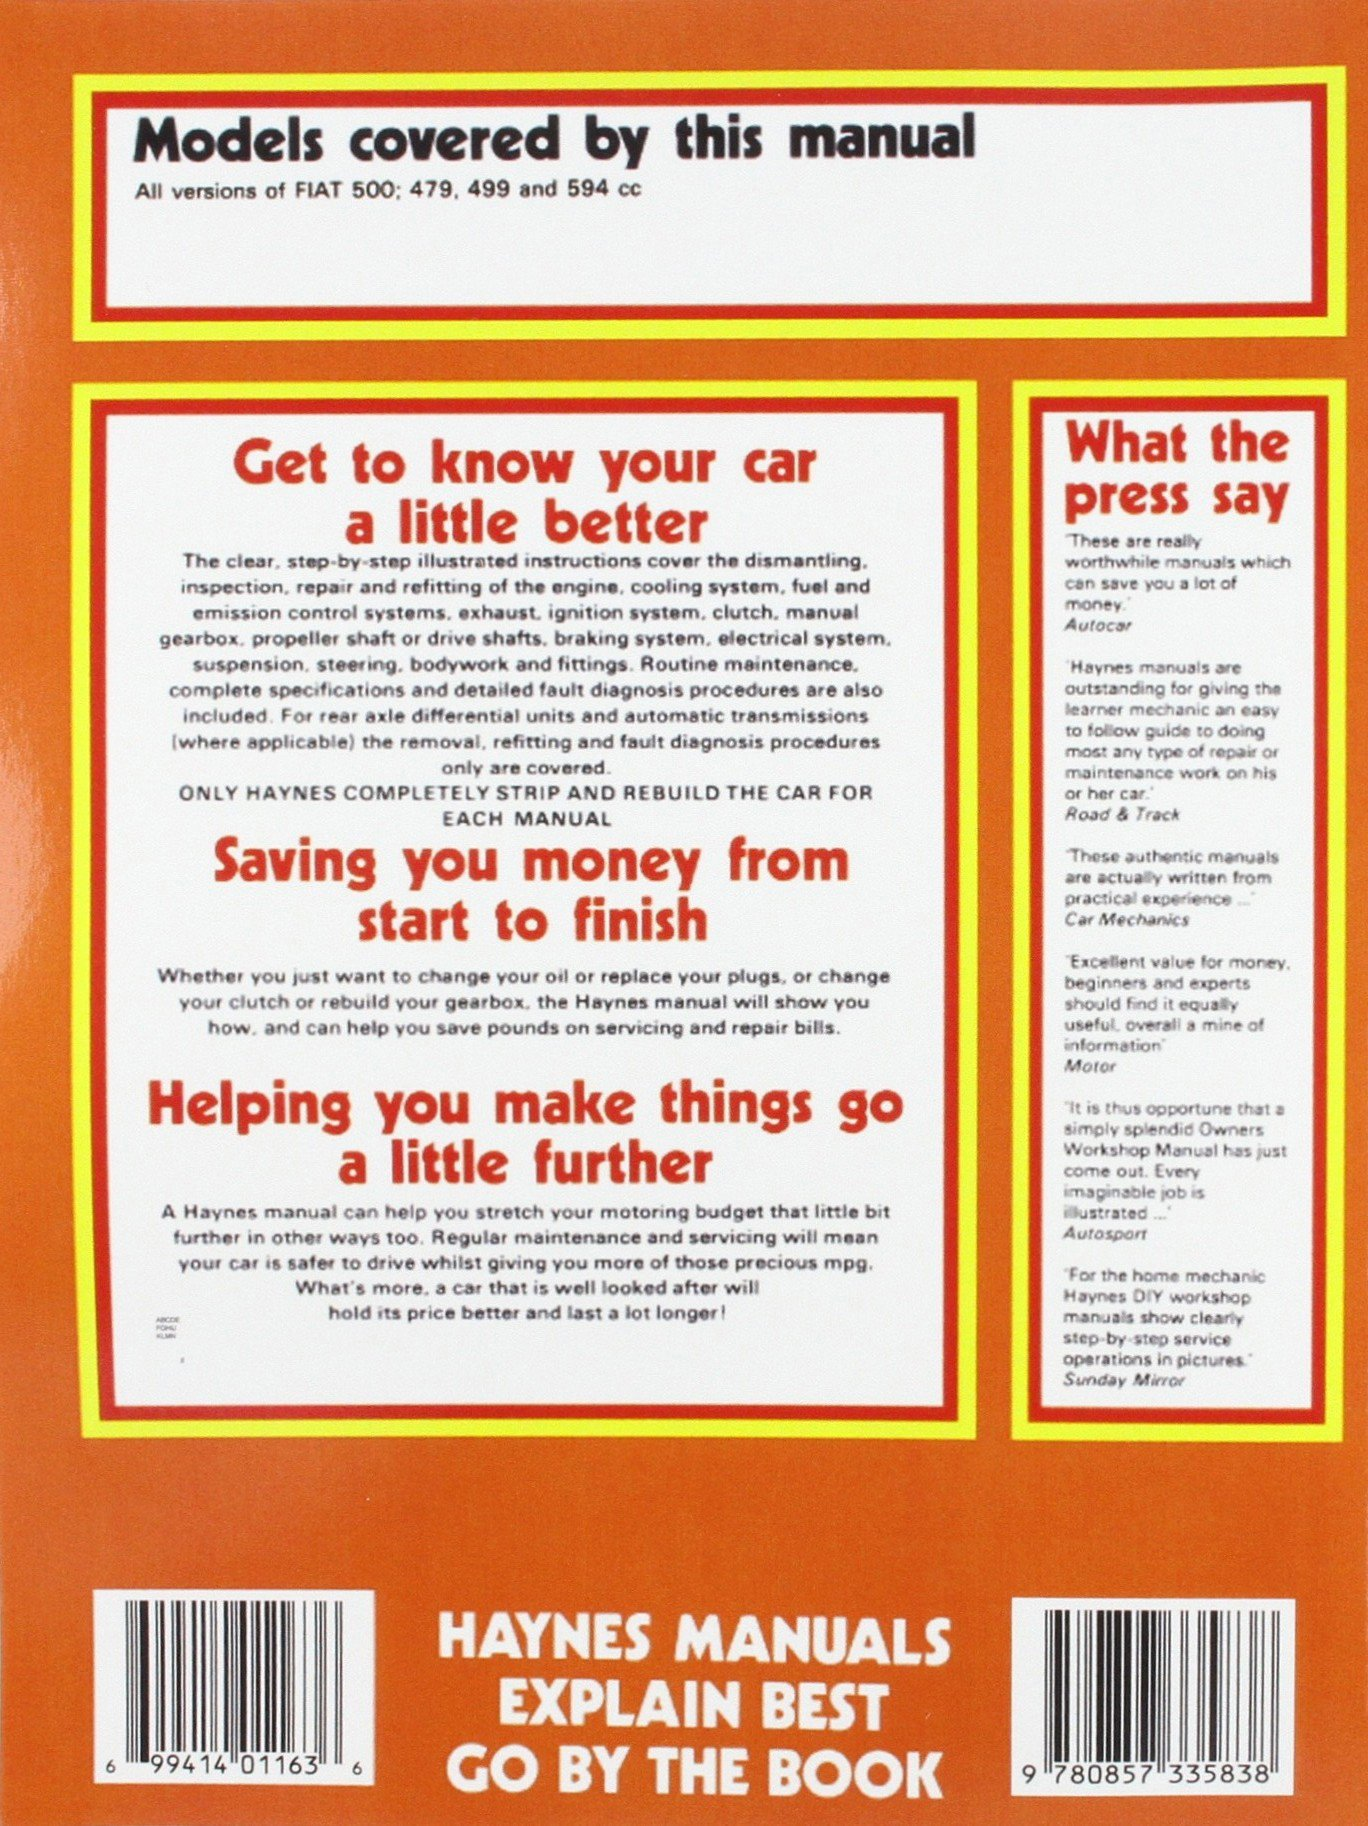 Fiat 500 Owner's Workshop Manual: James Larminie J. H. Haynes:  9780857335838: Amazon.com: Books